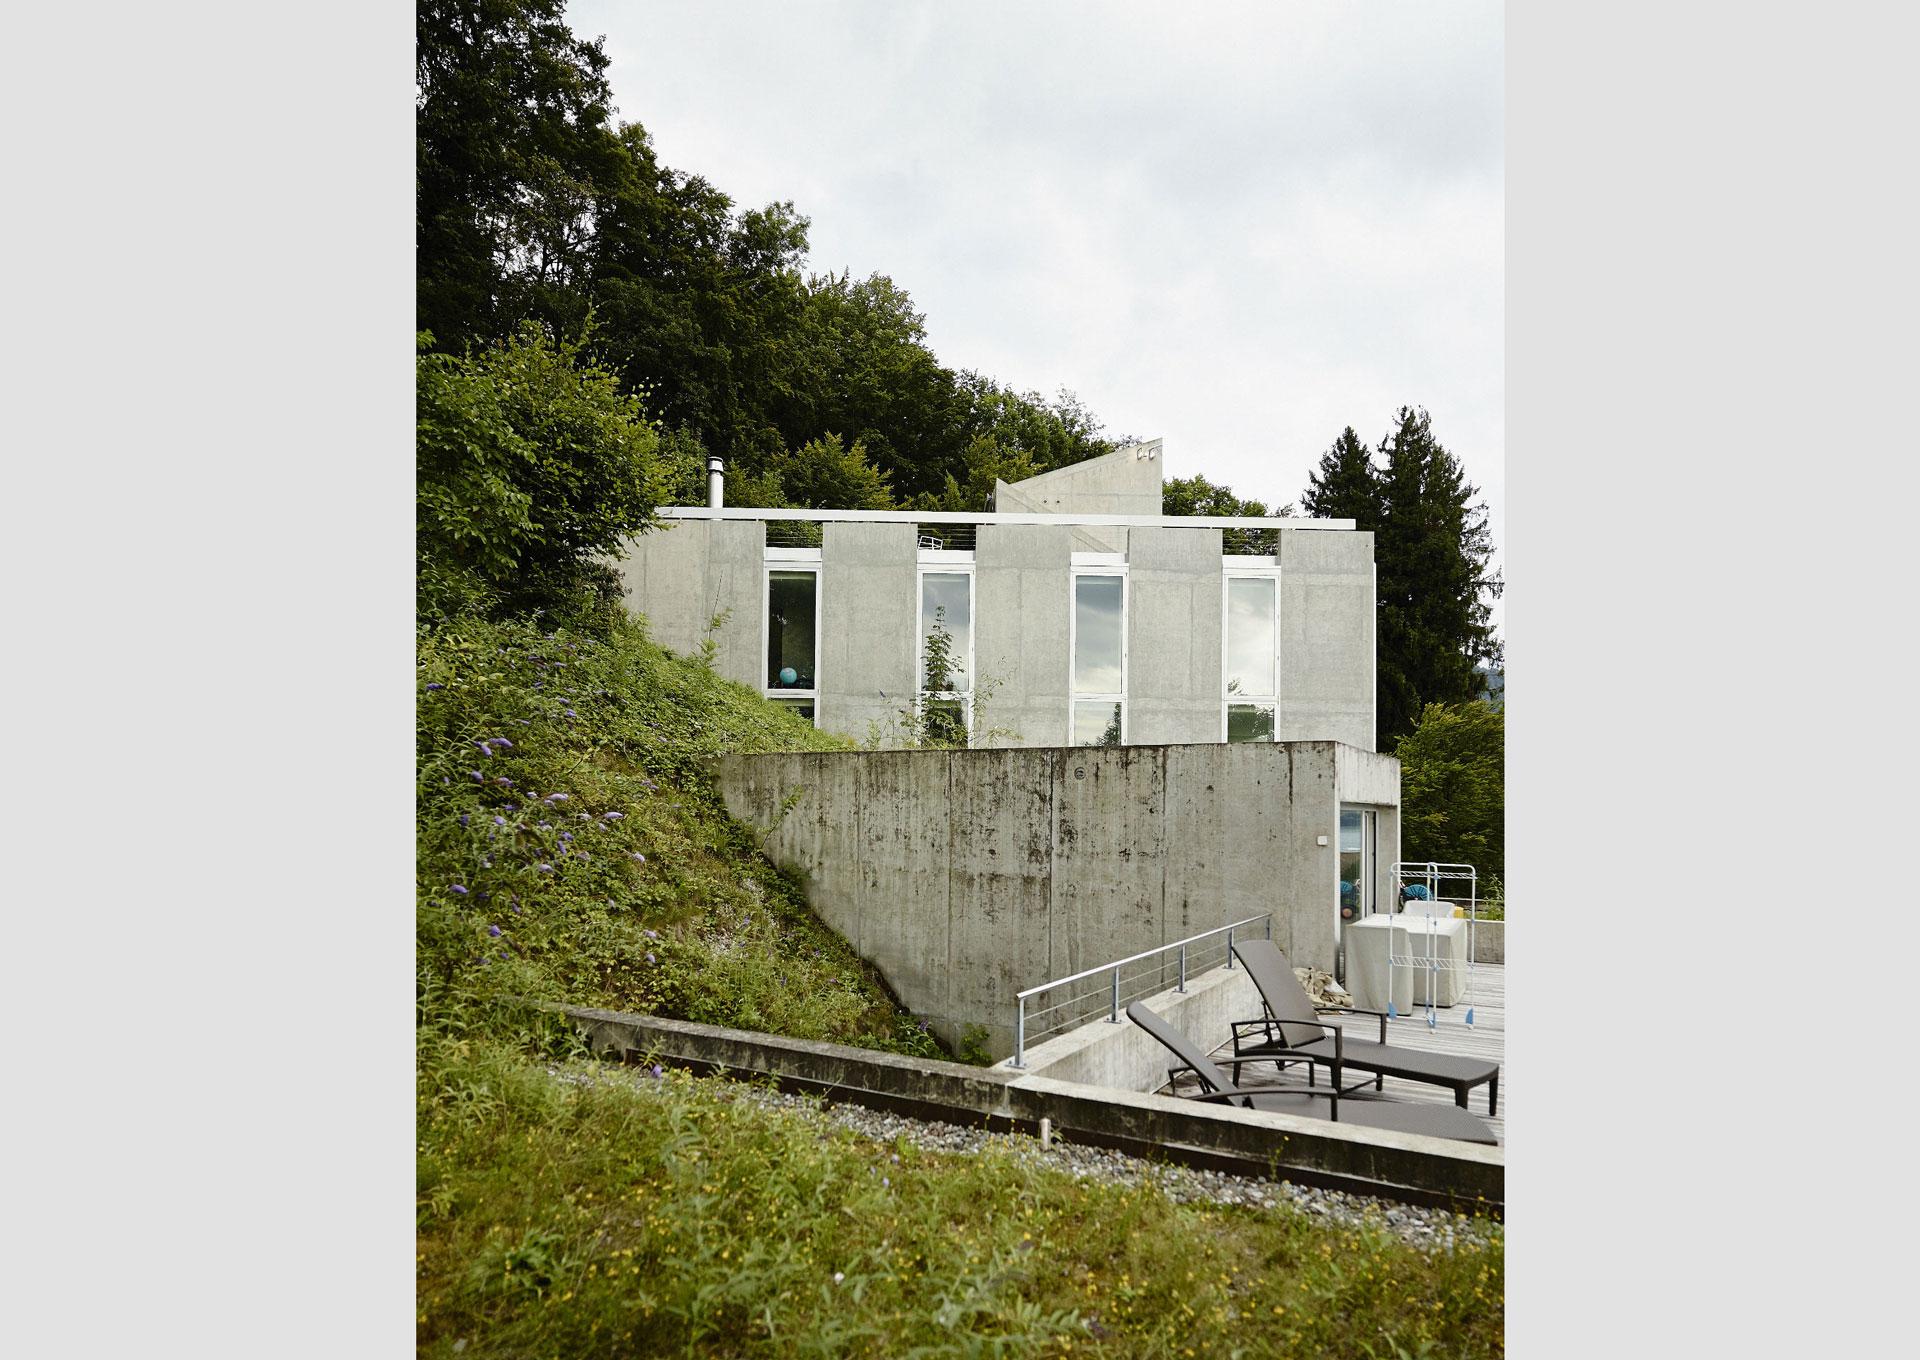 mondrianHouse-lakesidedevelopment-lsd-swiss-6-2